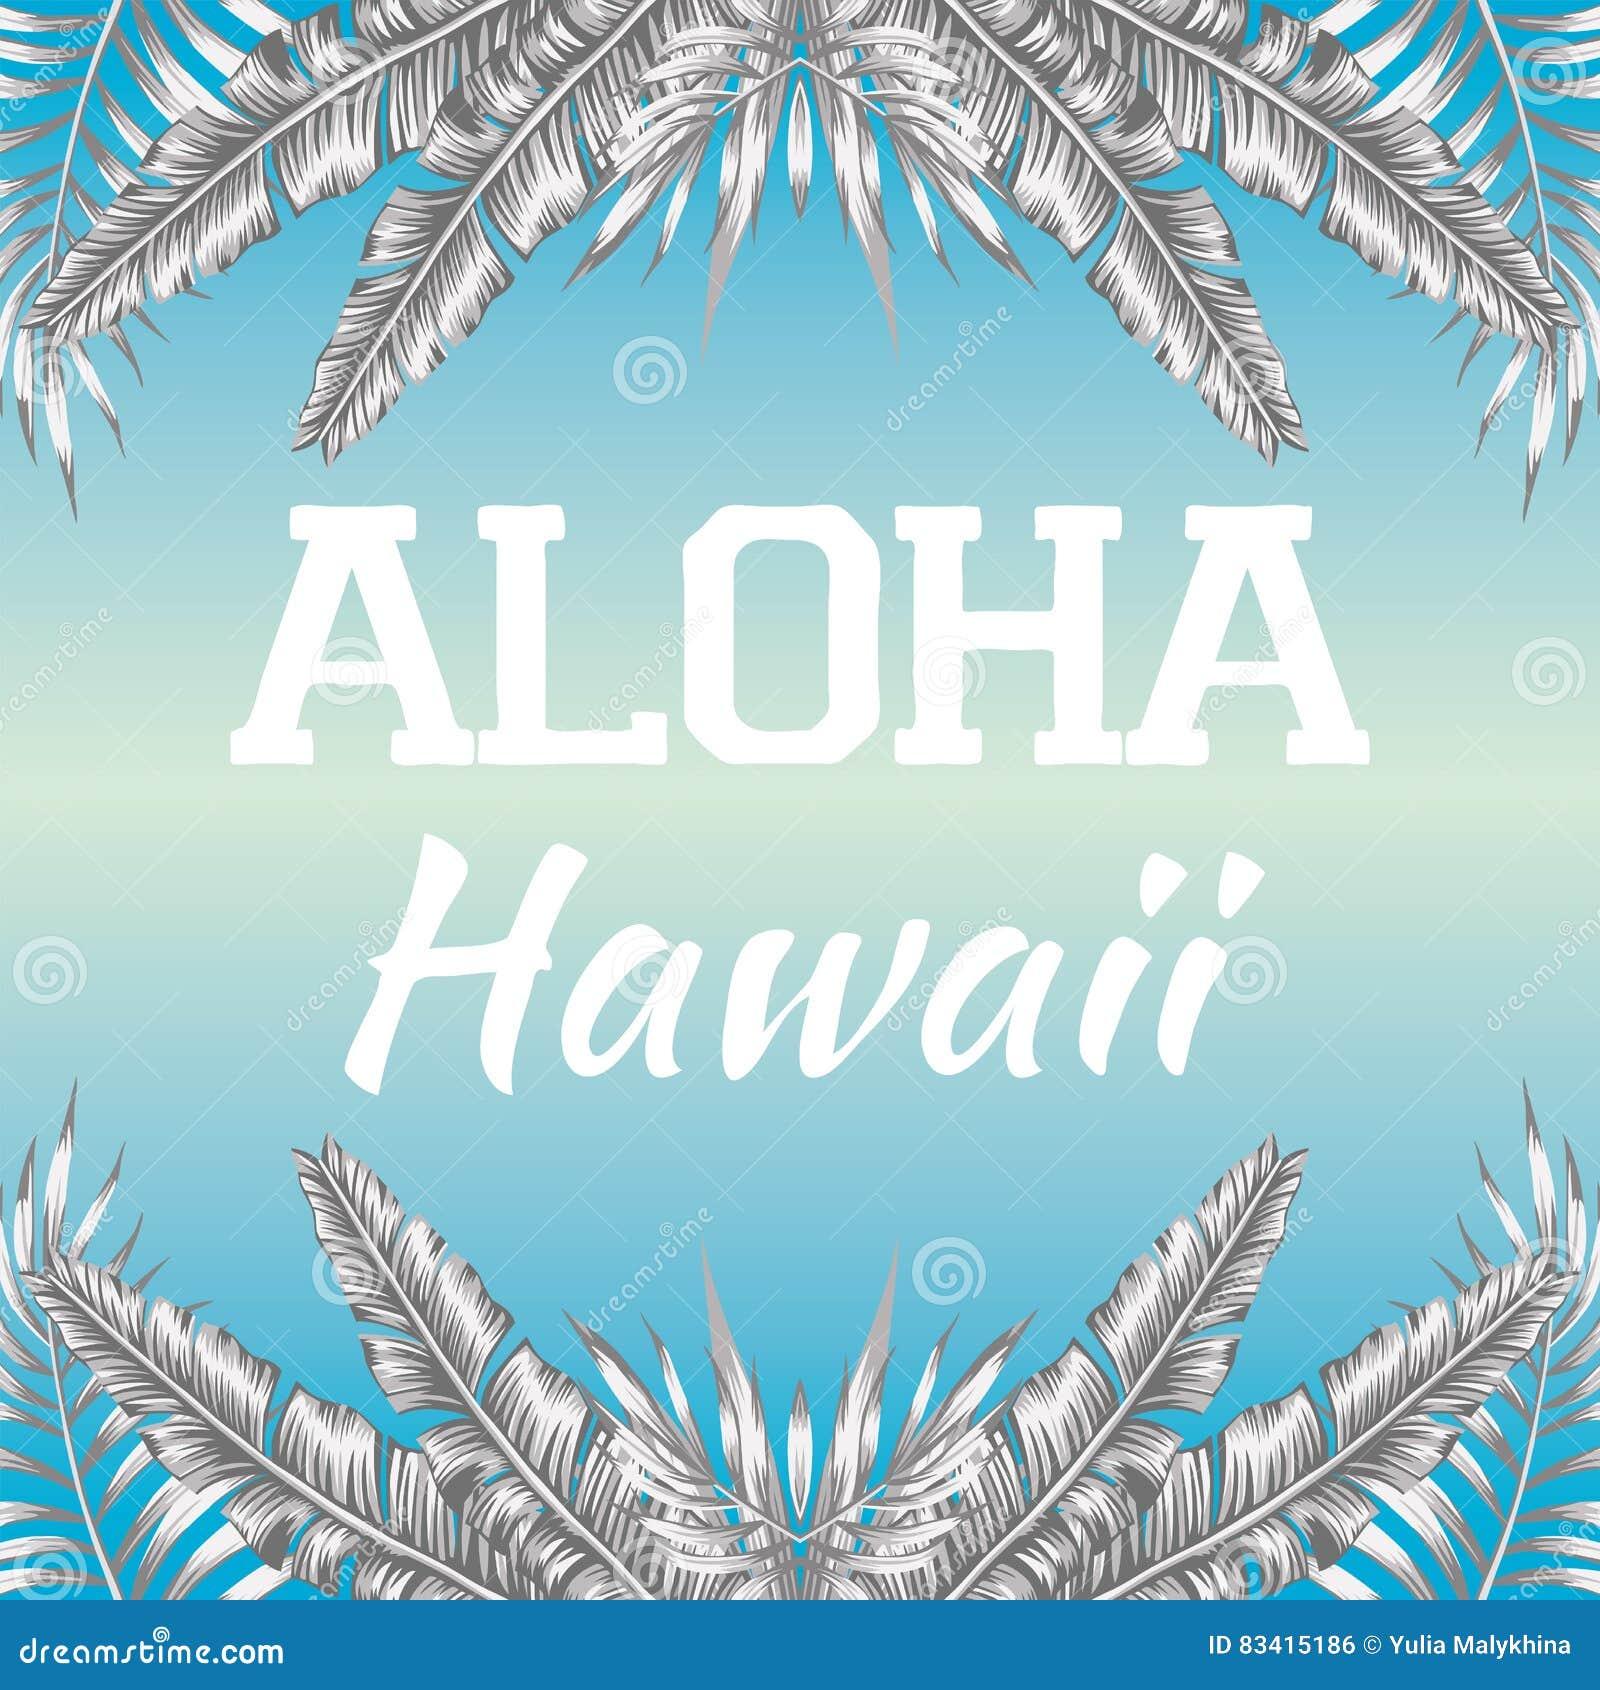 Slogan Aloha Hawaii Blue Background Royalty Free Illustration